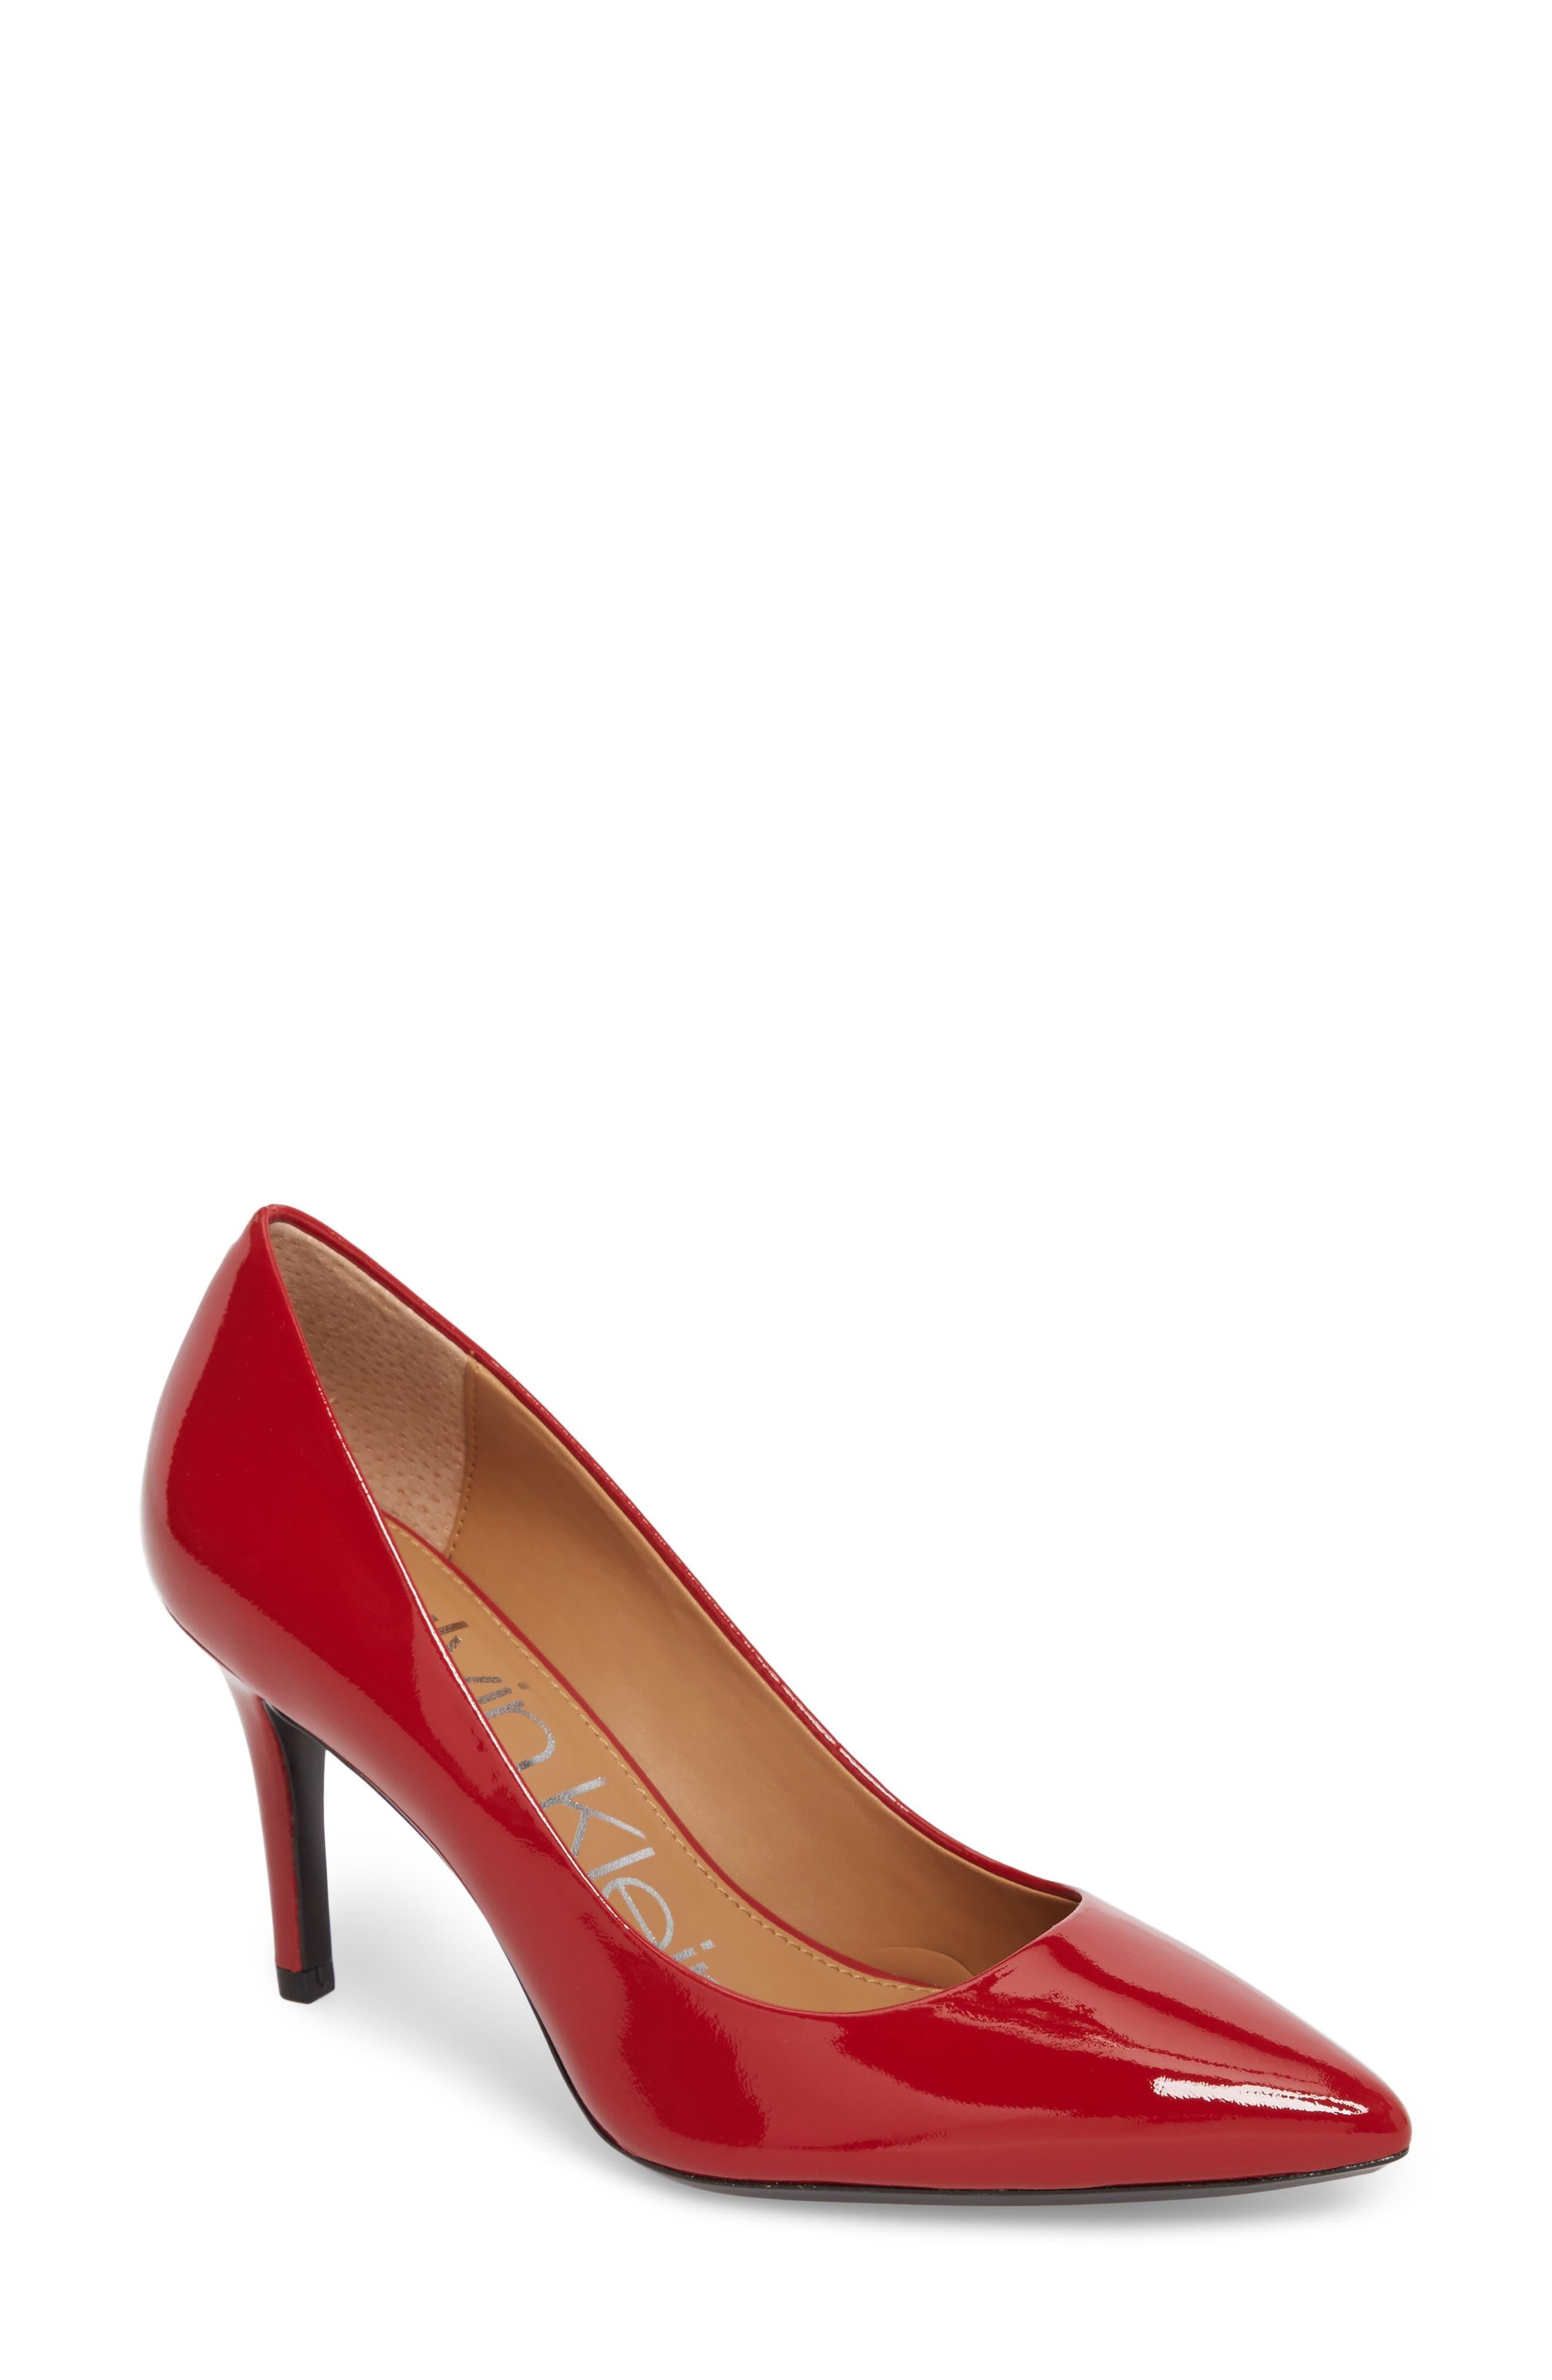 425bc20832a Women s Calvin Klein Shoes